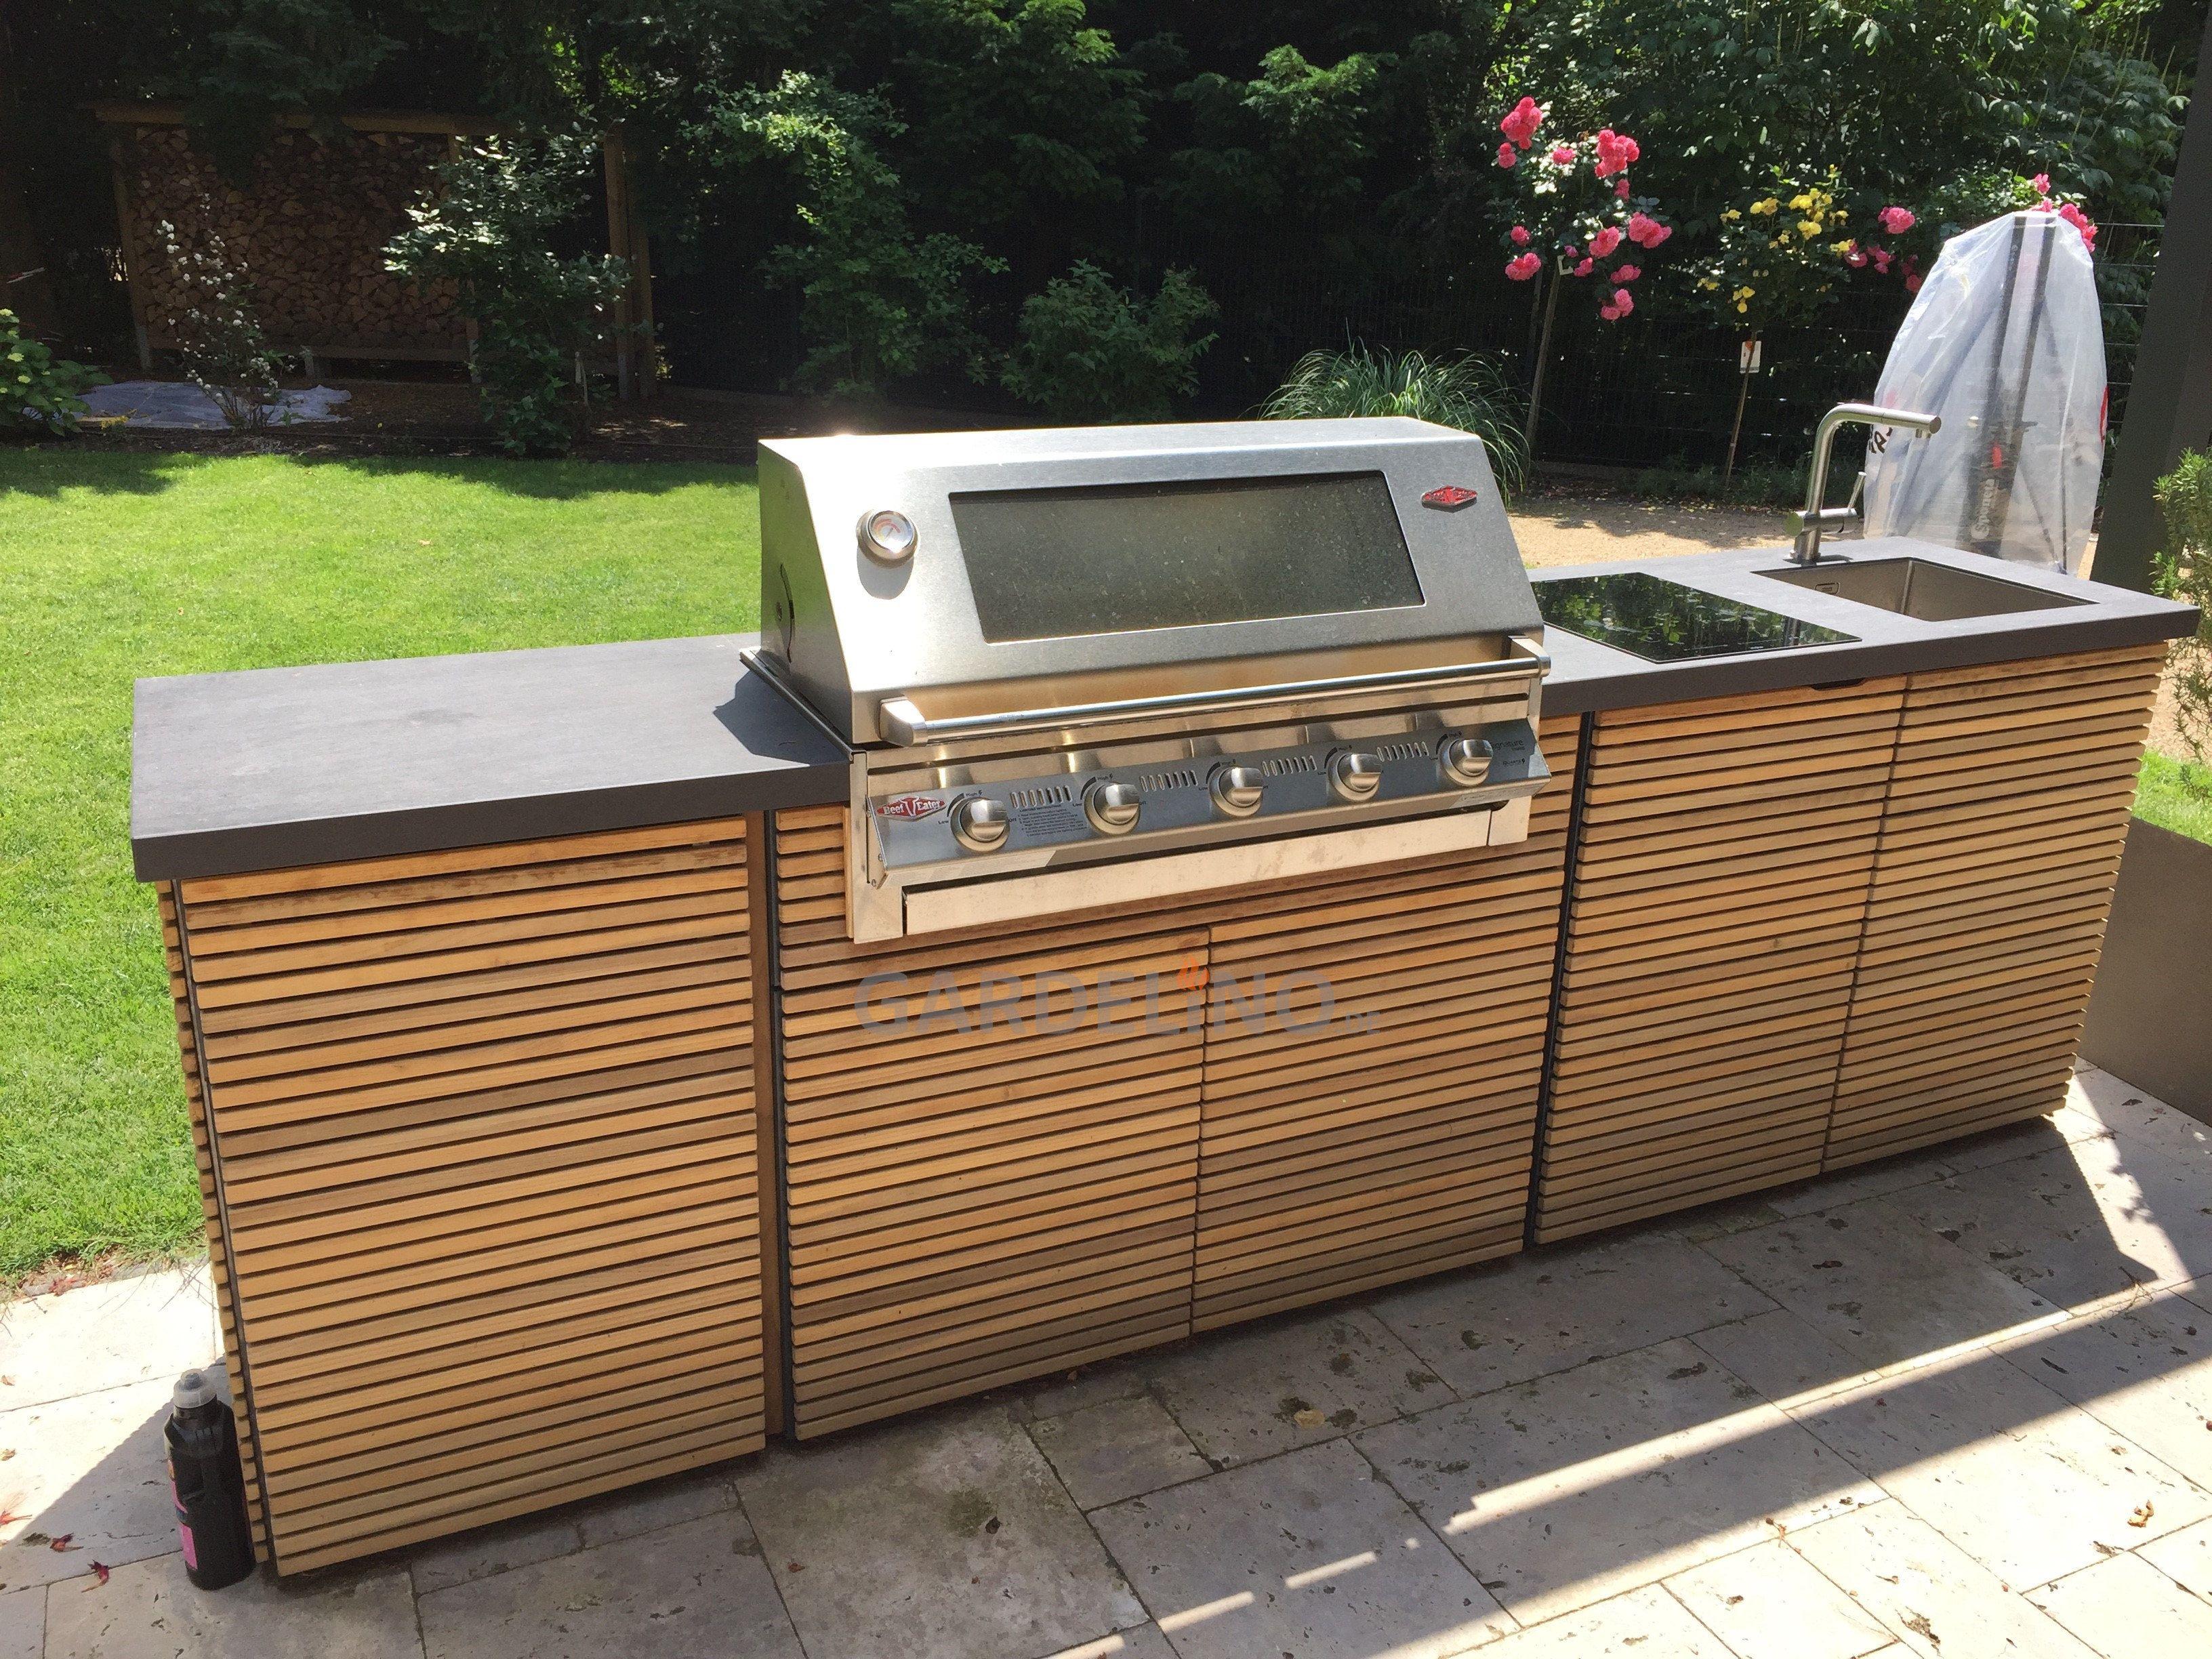 Outdoor Küche Bauen : Outdoor küche selber bauen aus holz outdoor küche selber bauen